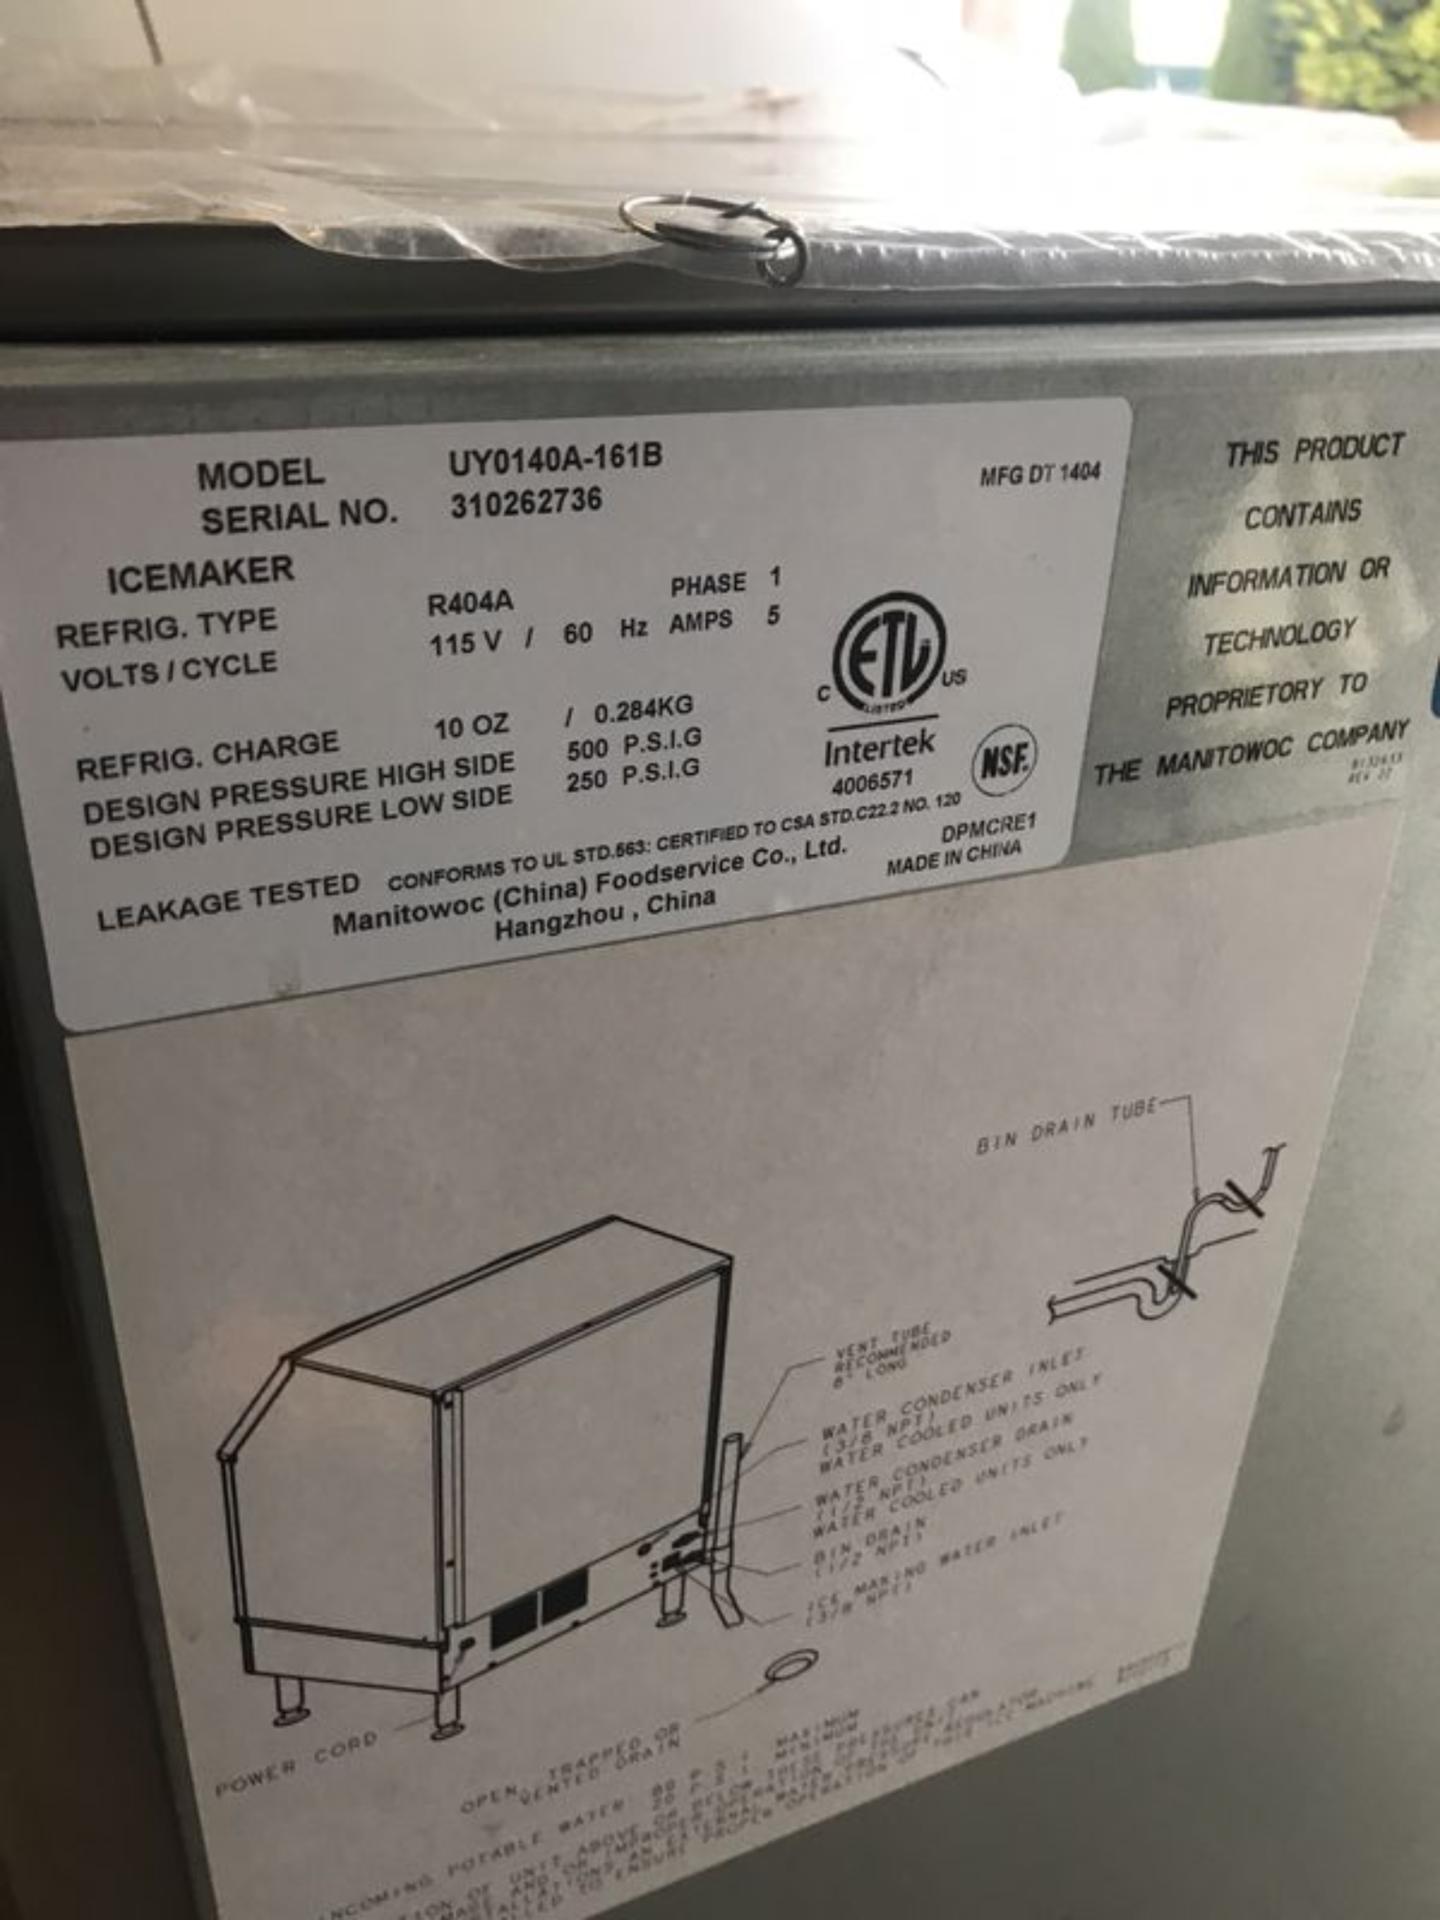 Manitowoc ice maker   Bloodydecks on ice maker wiring diagrams, copeland wiring diagrams, manitowoc ice machines filters cg-5 20s, manitowoc q450, ice box wiring diagrams, walk in cooler wiring diagrams, compressor wiring diagrams, hoshizaki wiring diagrams, pepsi machine wiring diagrams,